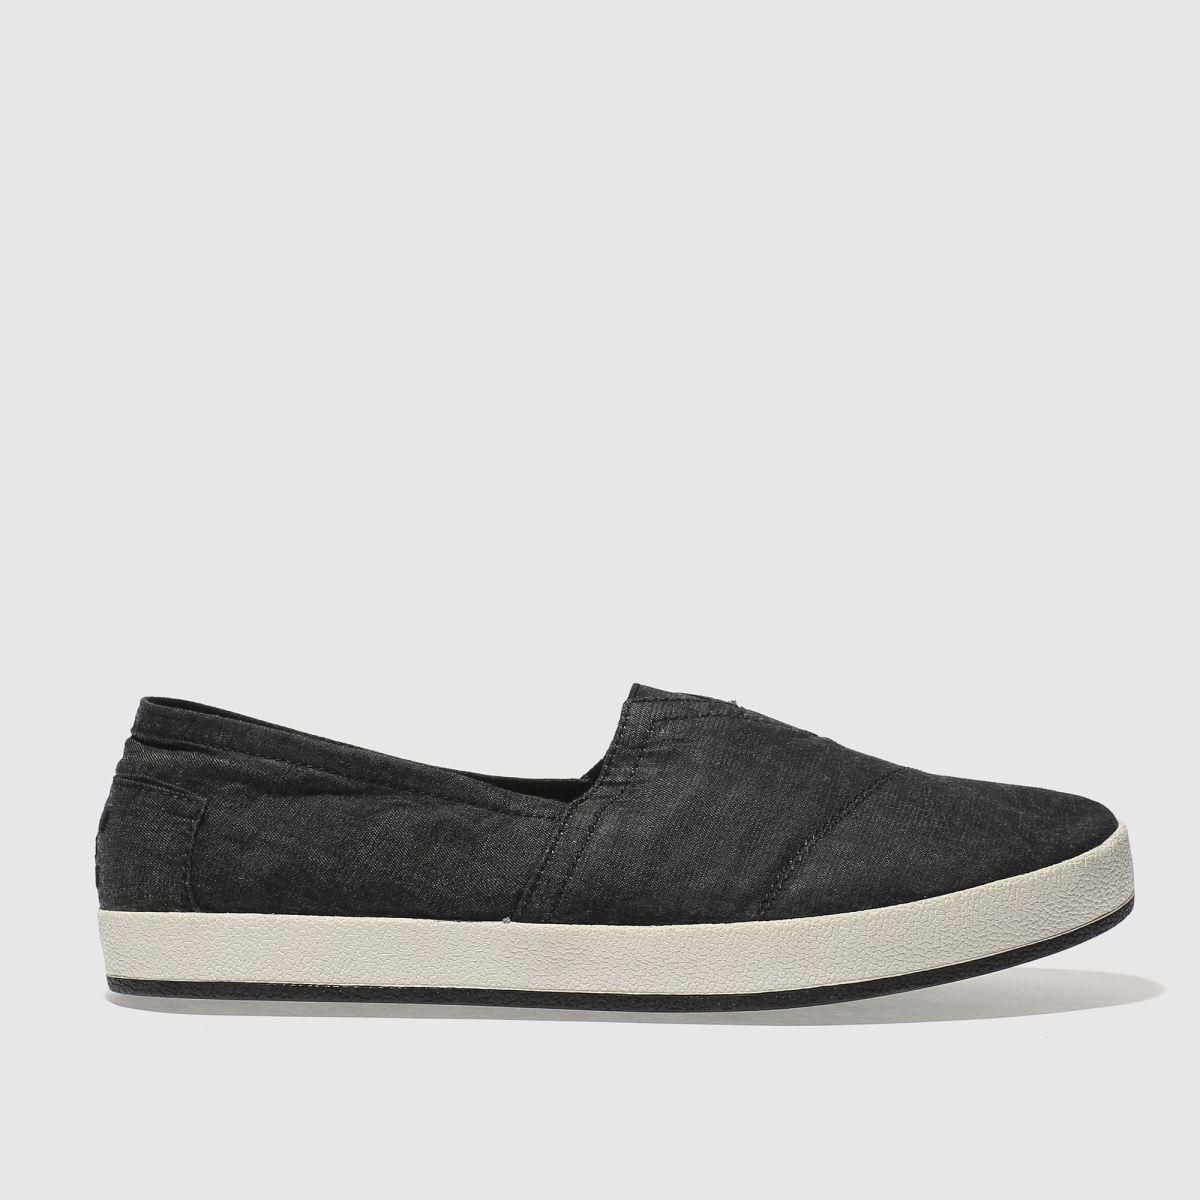 Toms Black & White Avalon Shoes